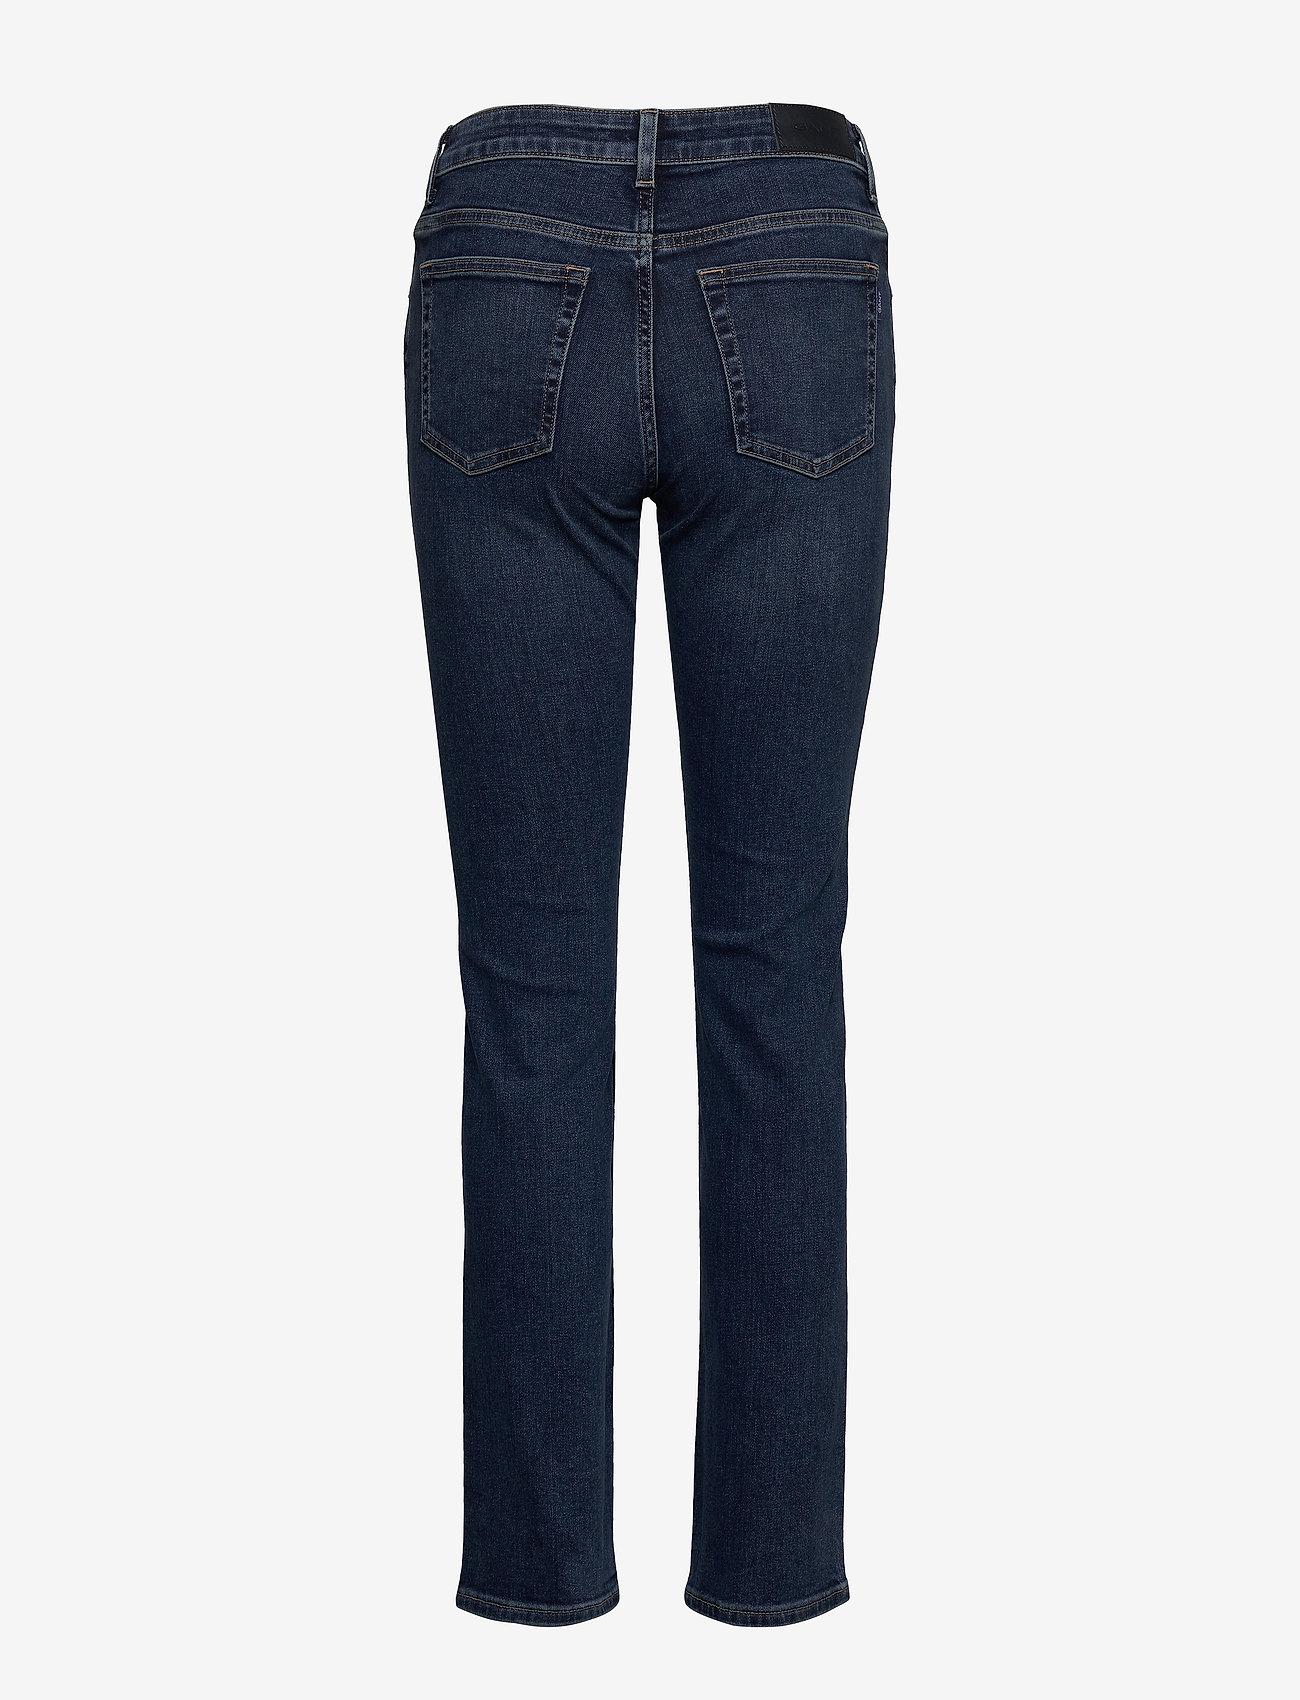 Gant - SLIM SUPER STRETCH JEANS - slim jeans - dark blue worn in